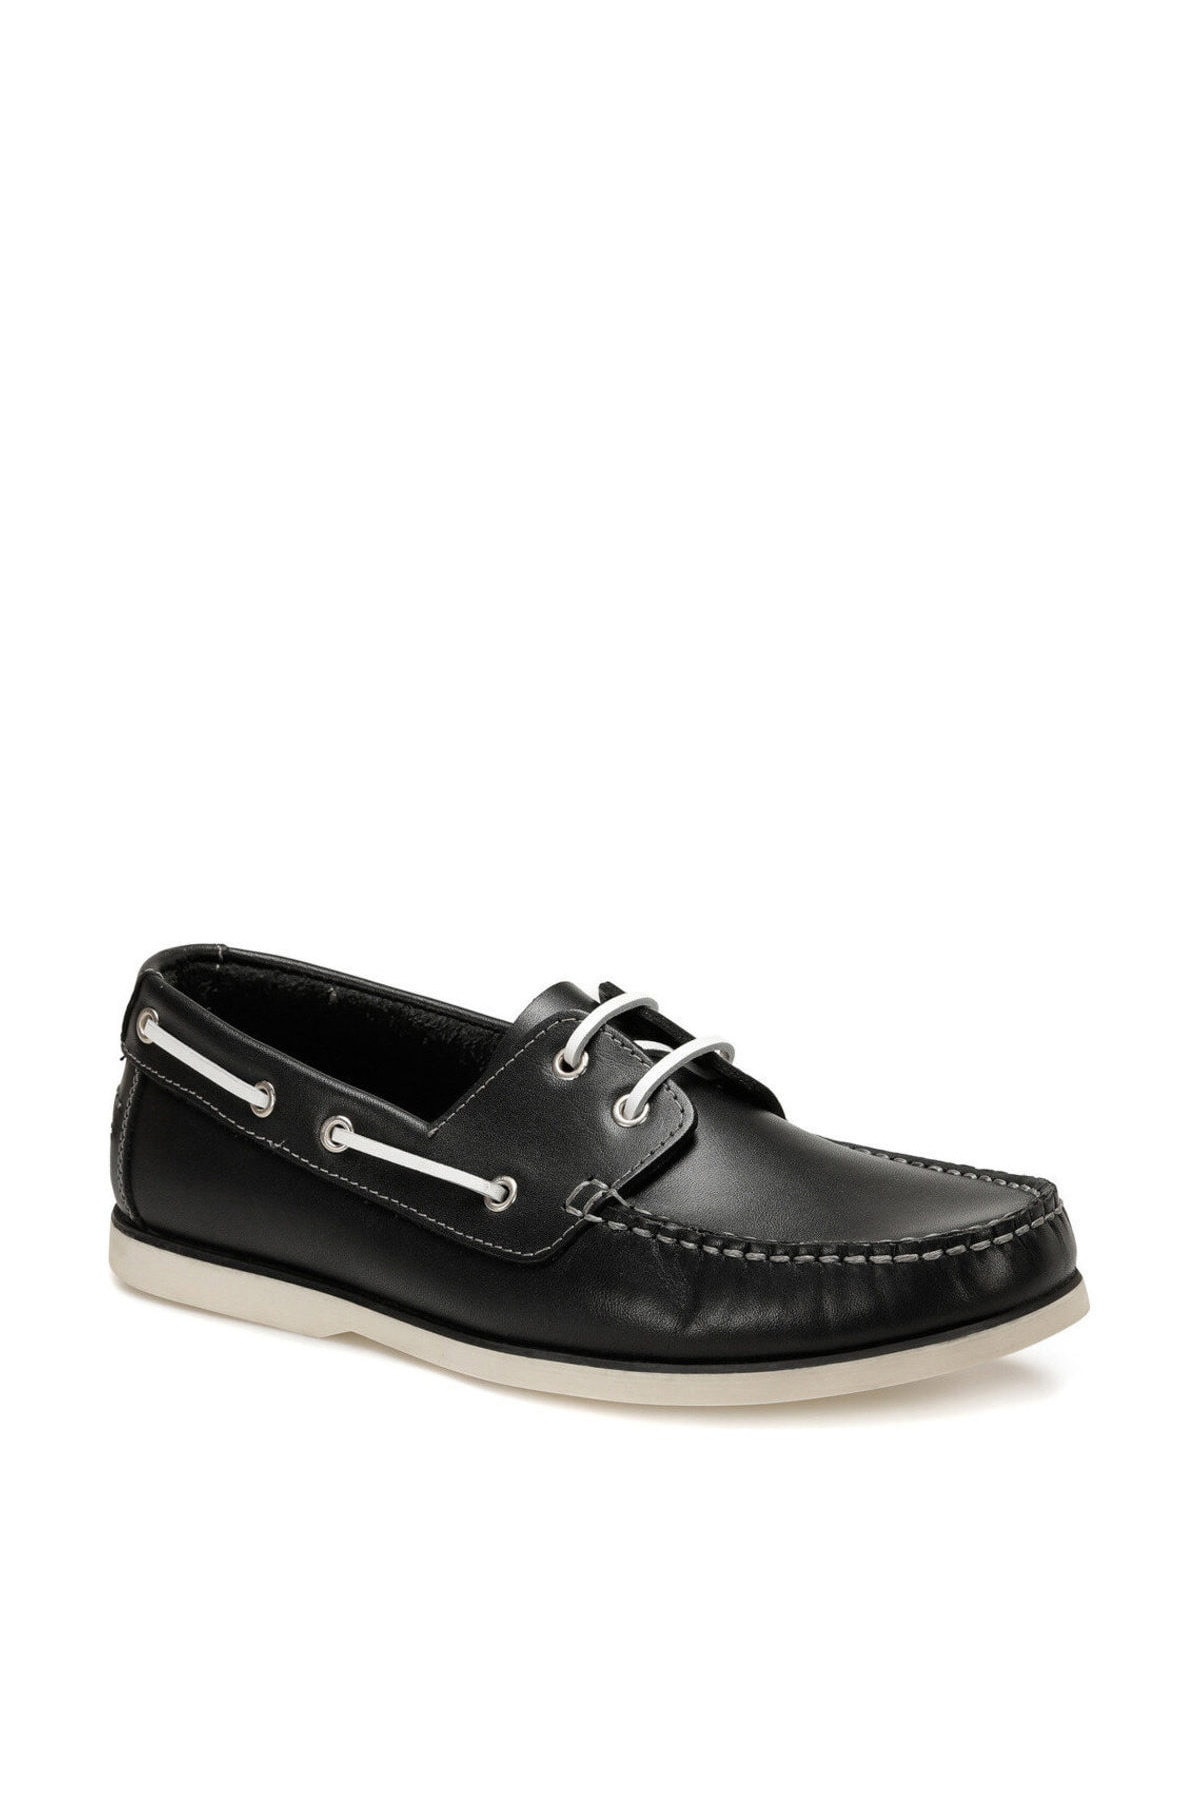 OXIDE MRB81 Siyah Erkek Ayakkabı 100518297 1